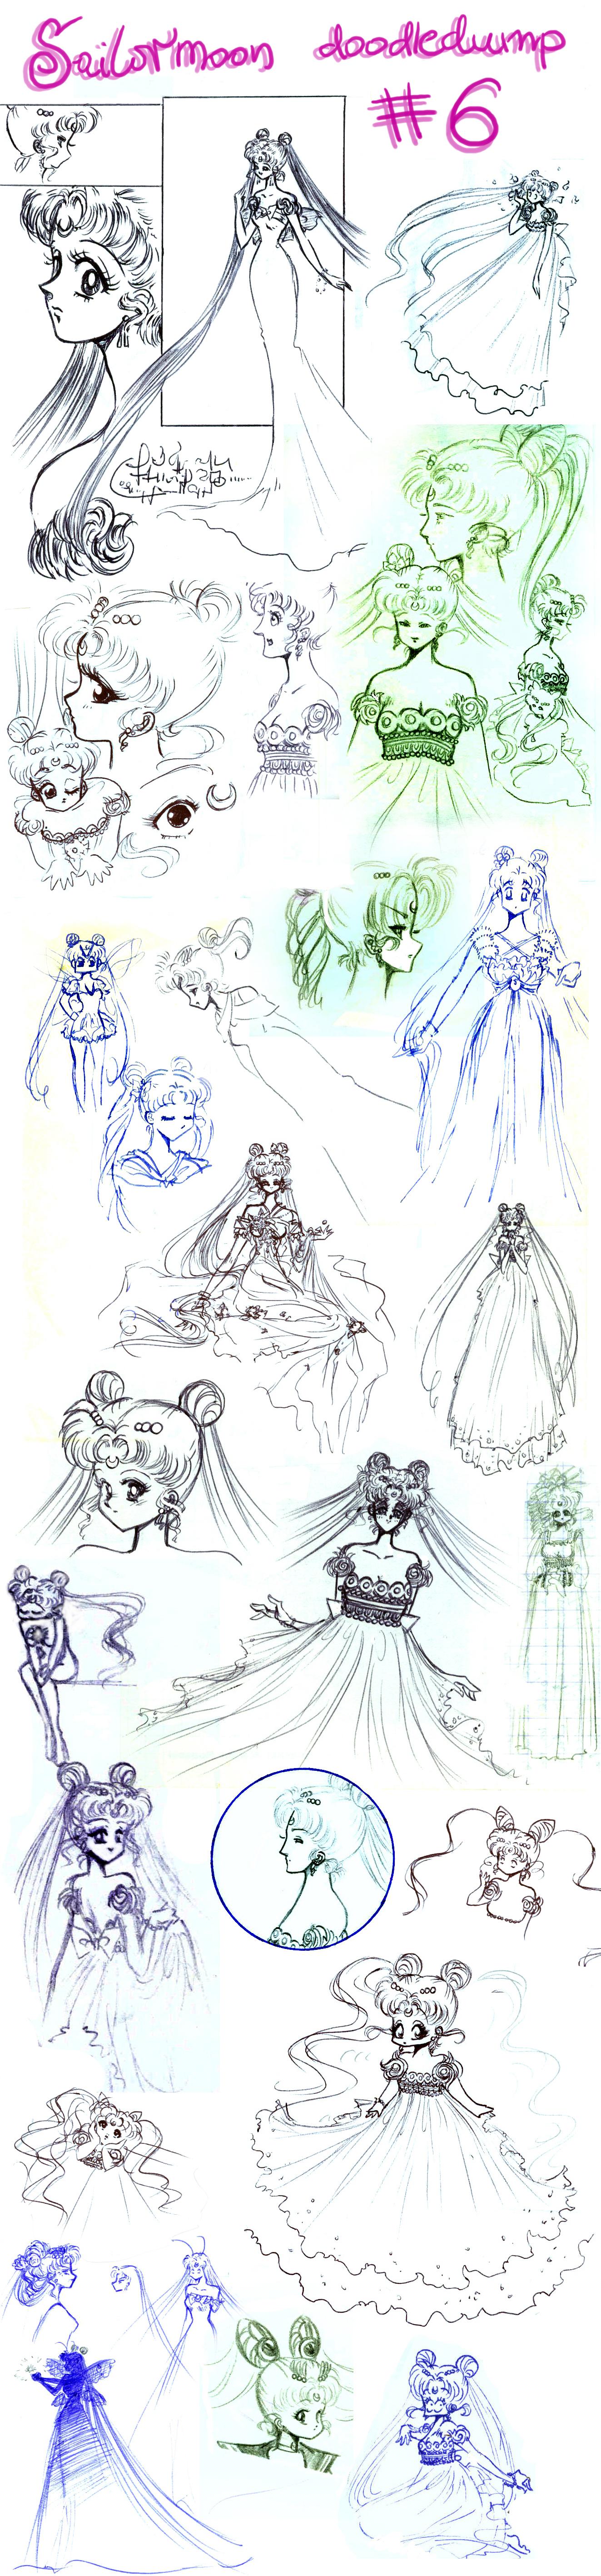 Sailormoon doodledump 6 by NitroFieja